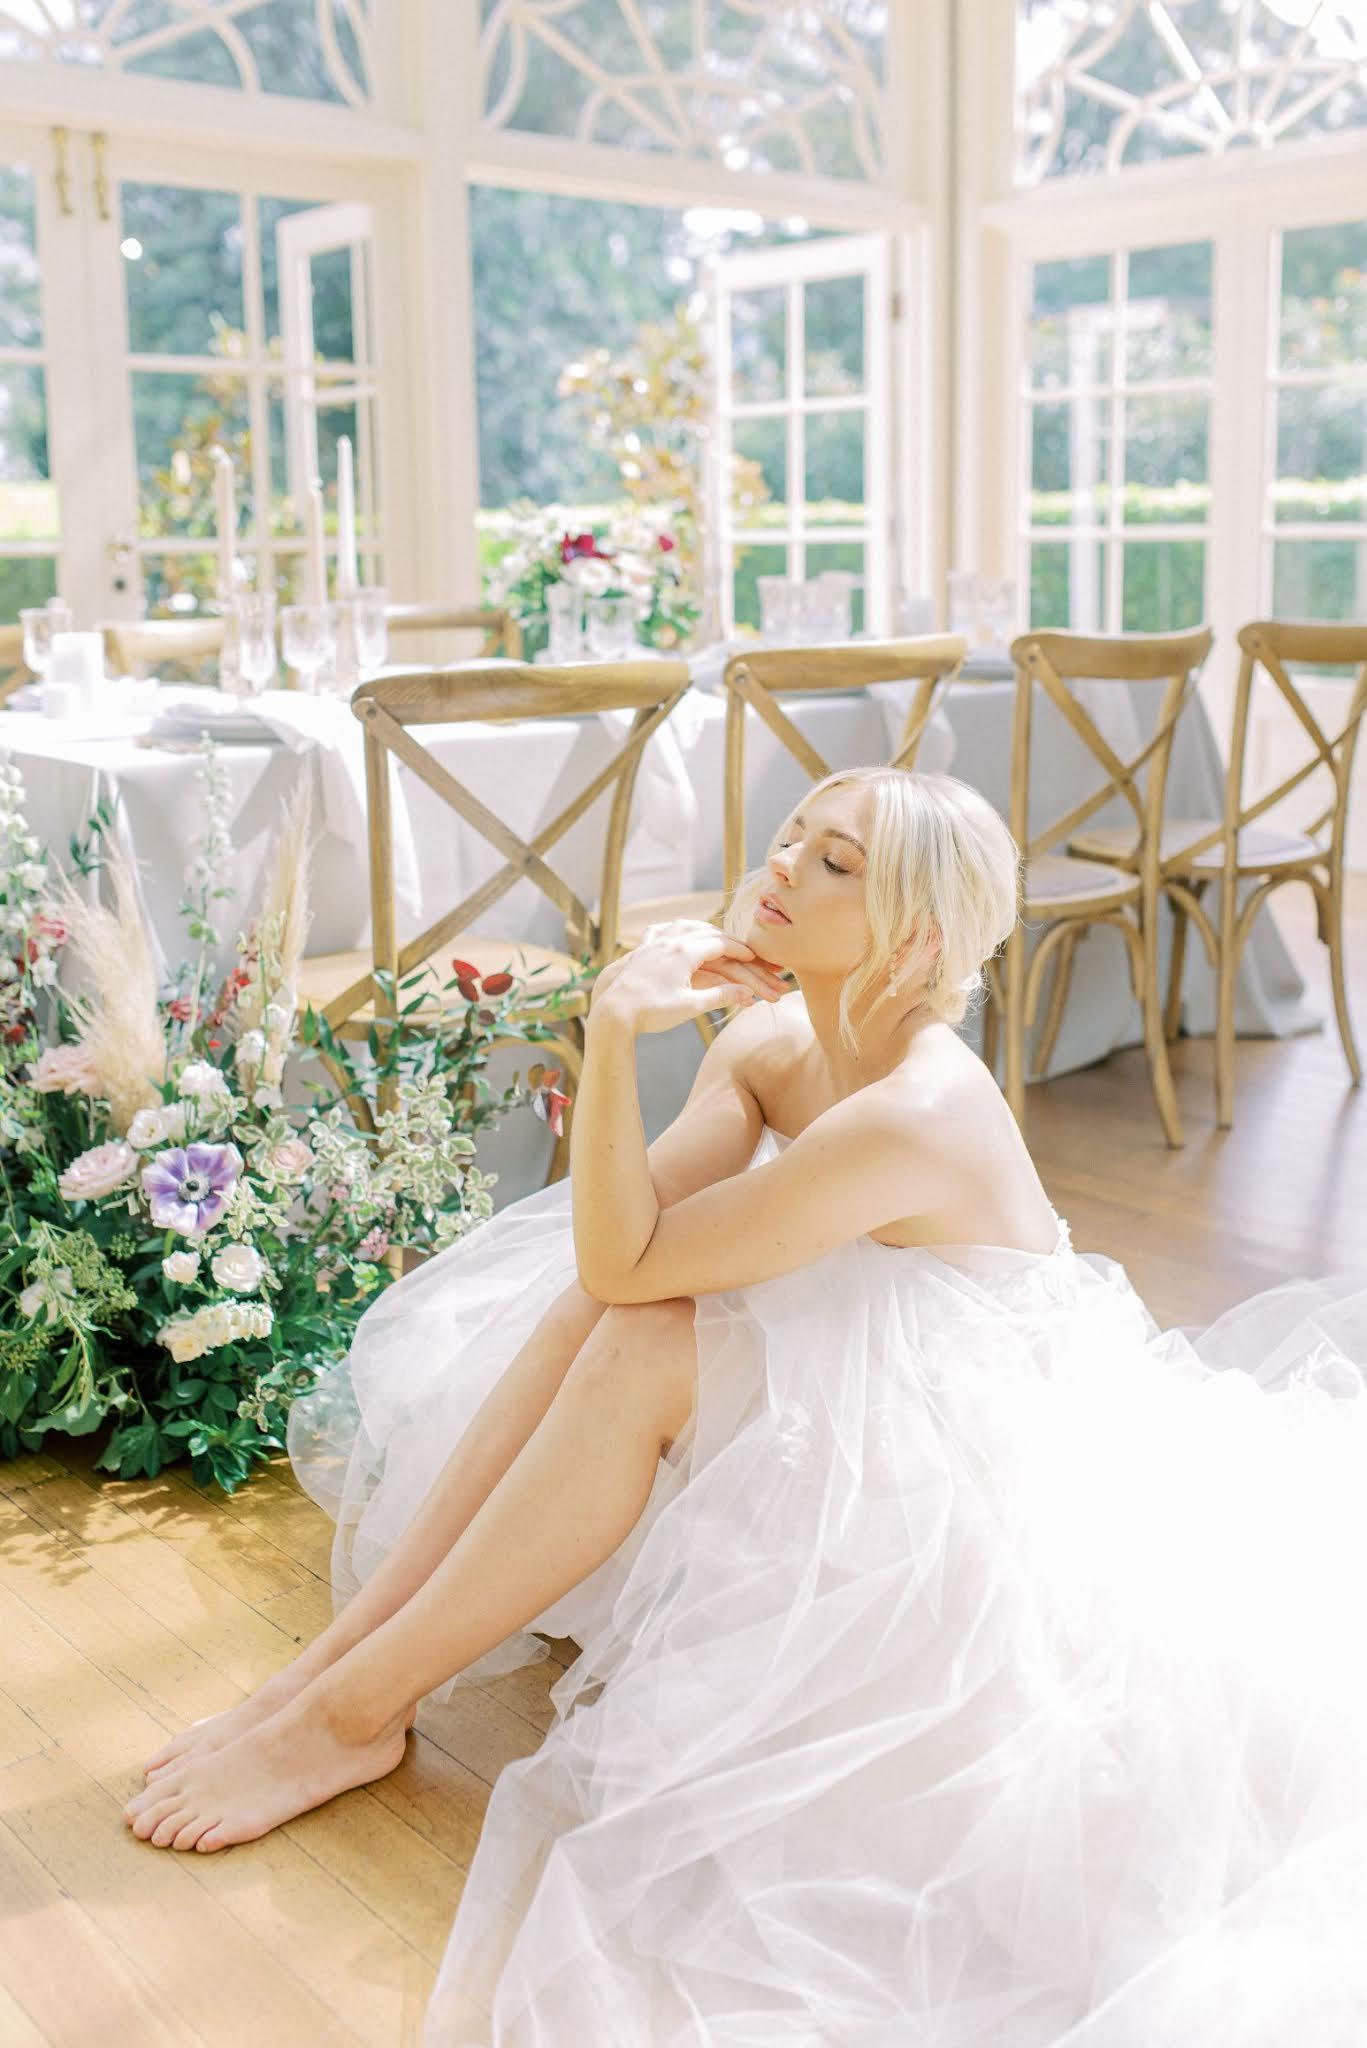 lauren olivia photography toowoomba weddings gabbinbar homestead bridal gowns accessories venue floral design stationery